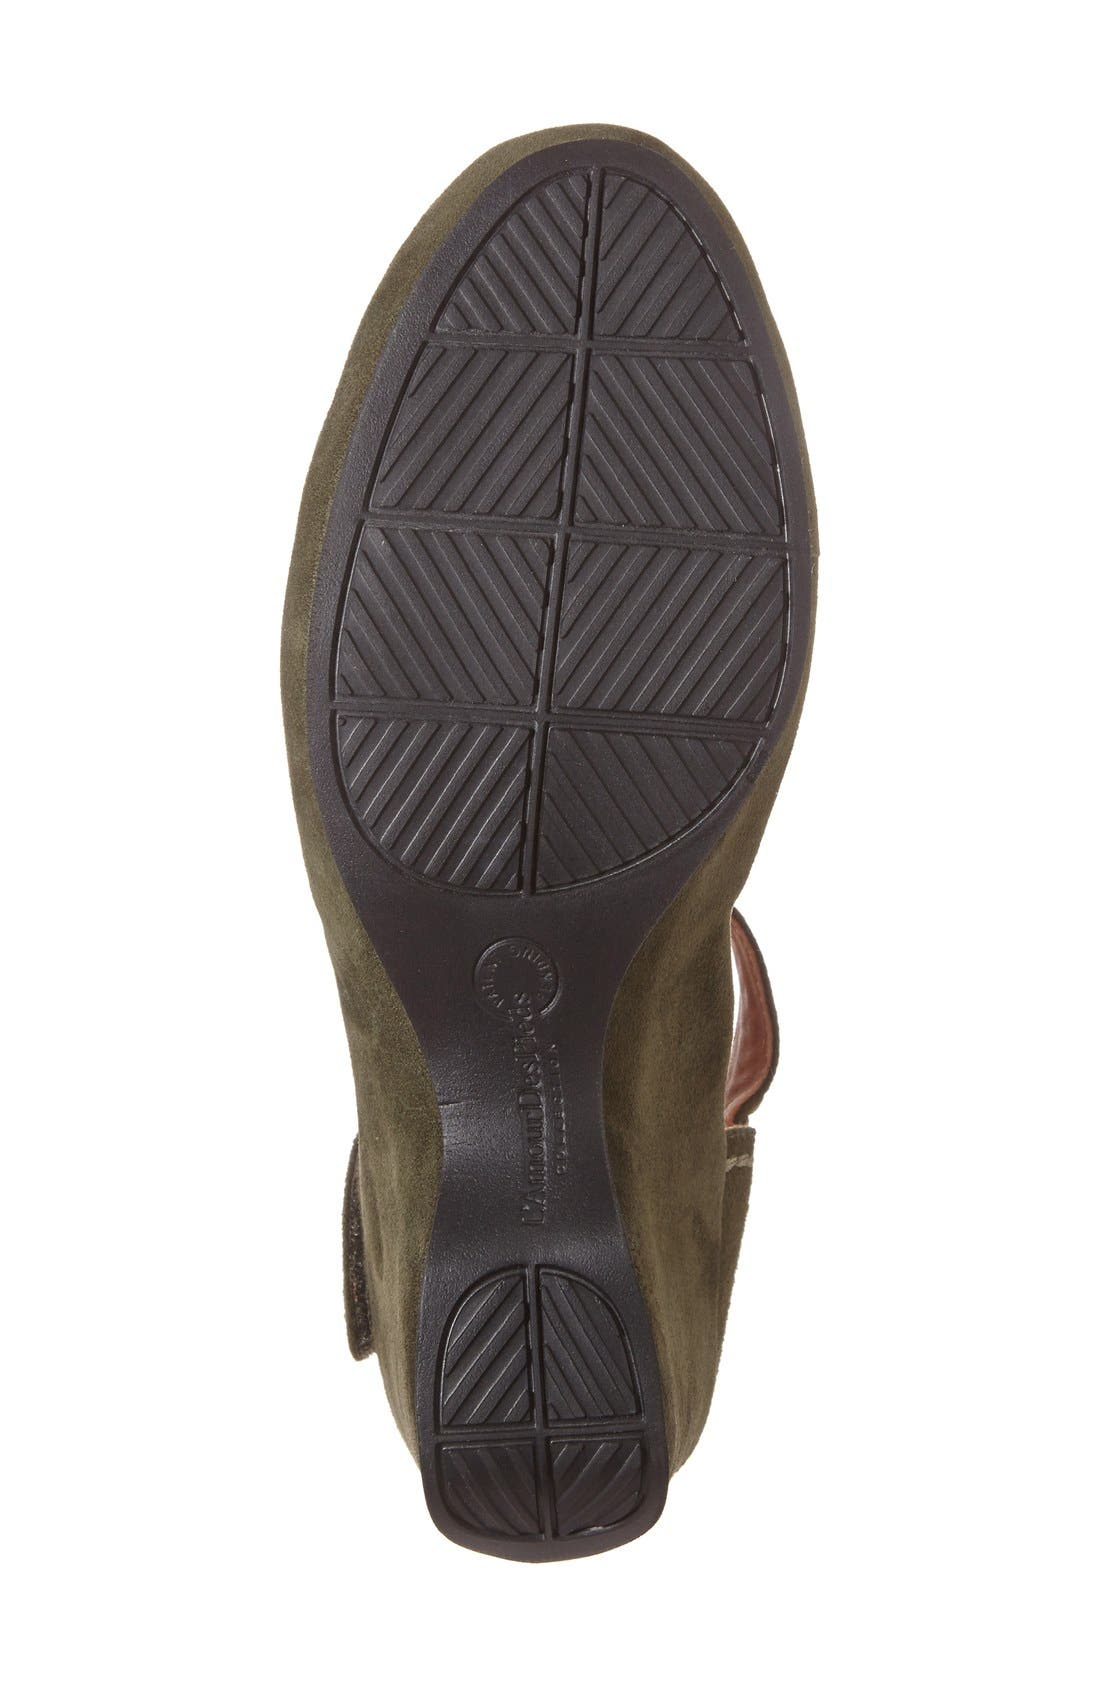 Alternate Image 4  - L'Amourdes Pieds'Orva' Wedge Sandal (Women)